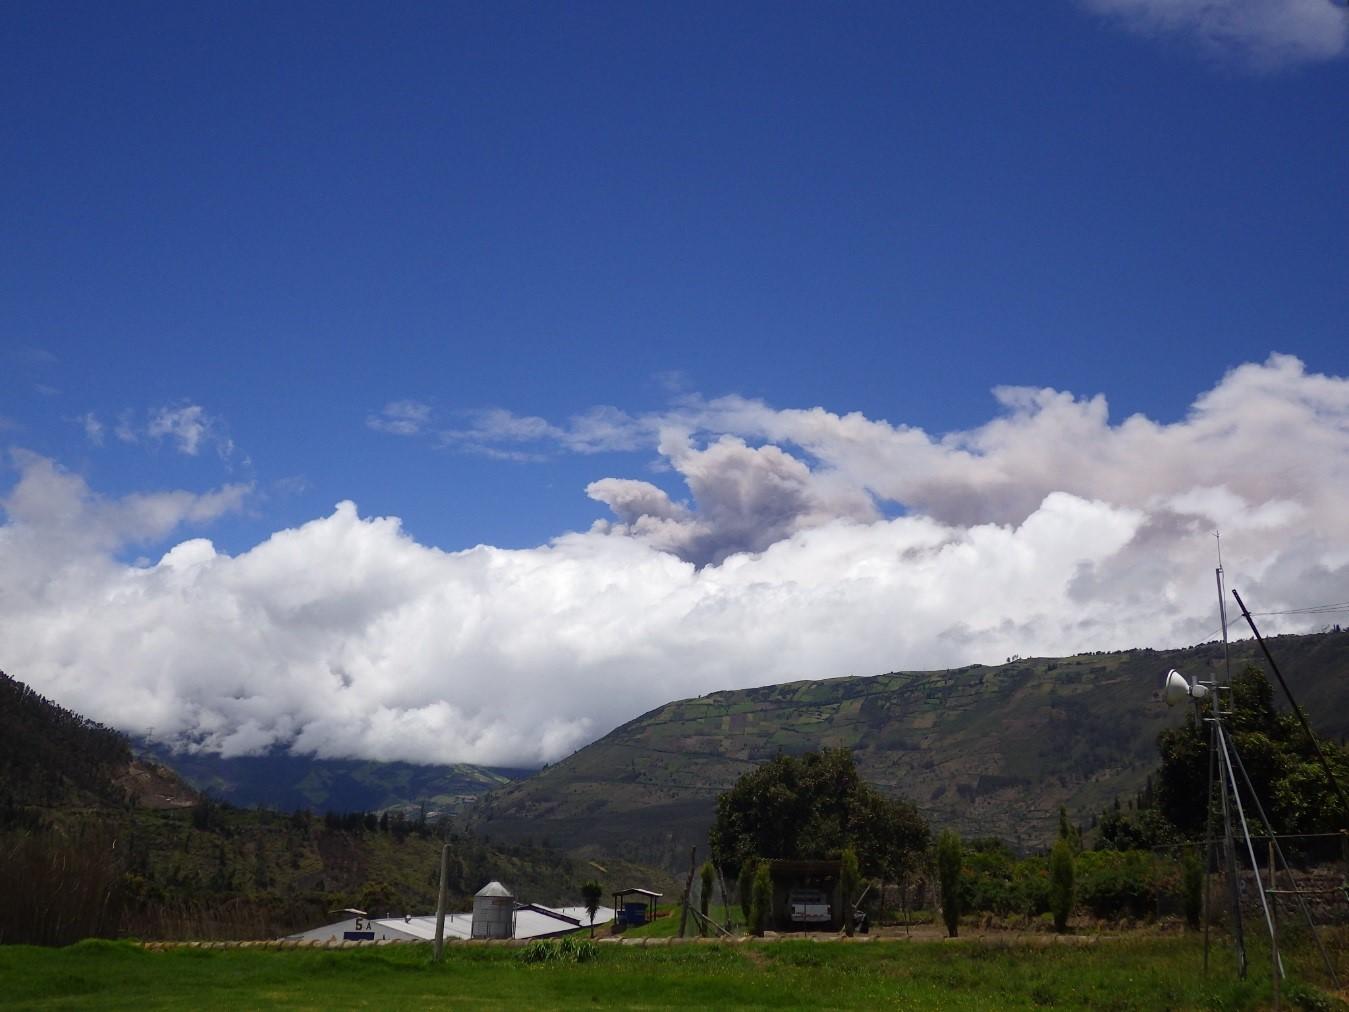 Ash emission from Tungurahua on 6 April 2015 (IGPEN)